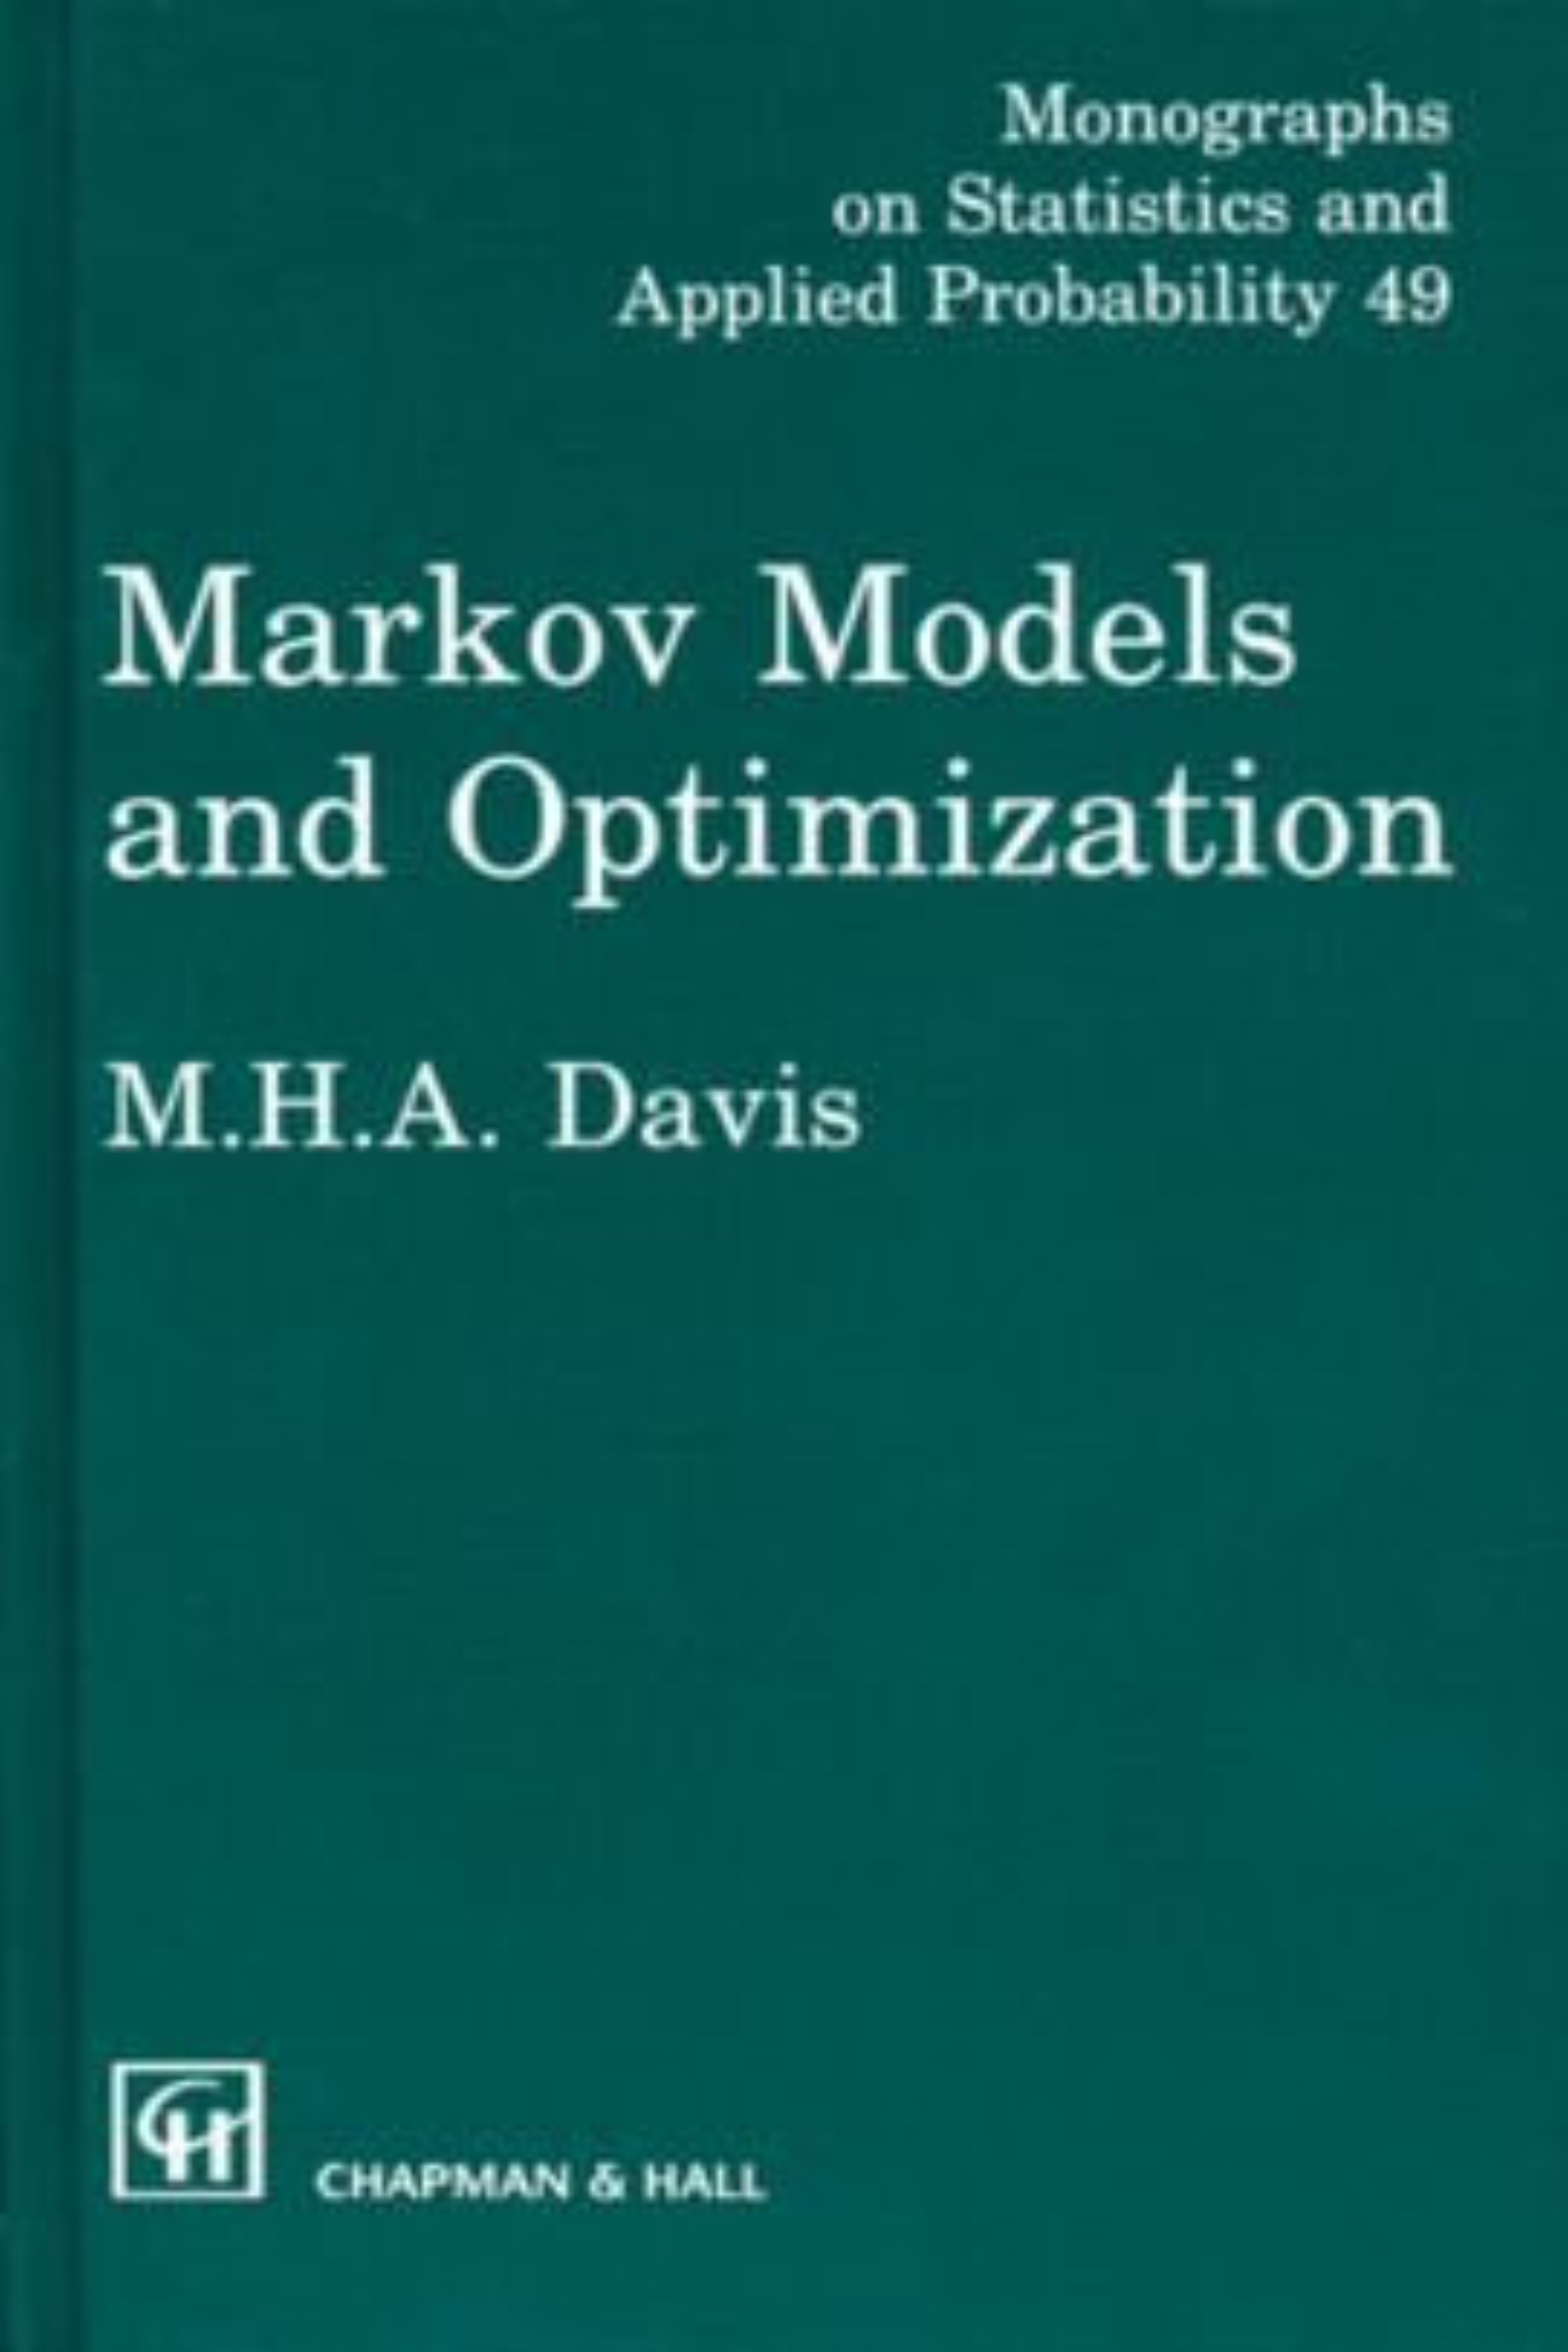 Markov Models and Optimization